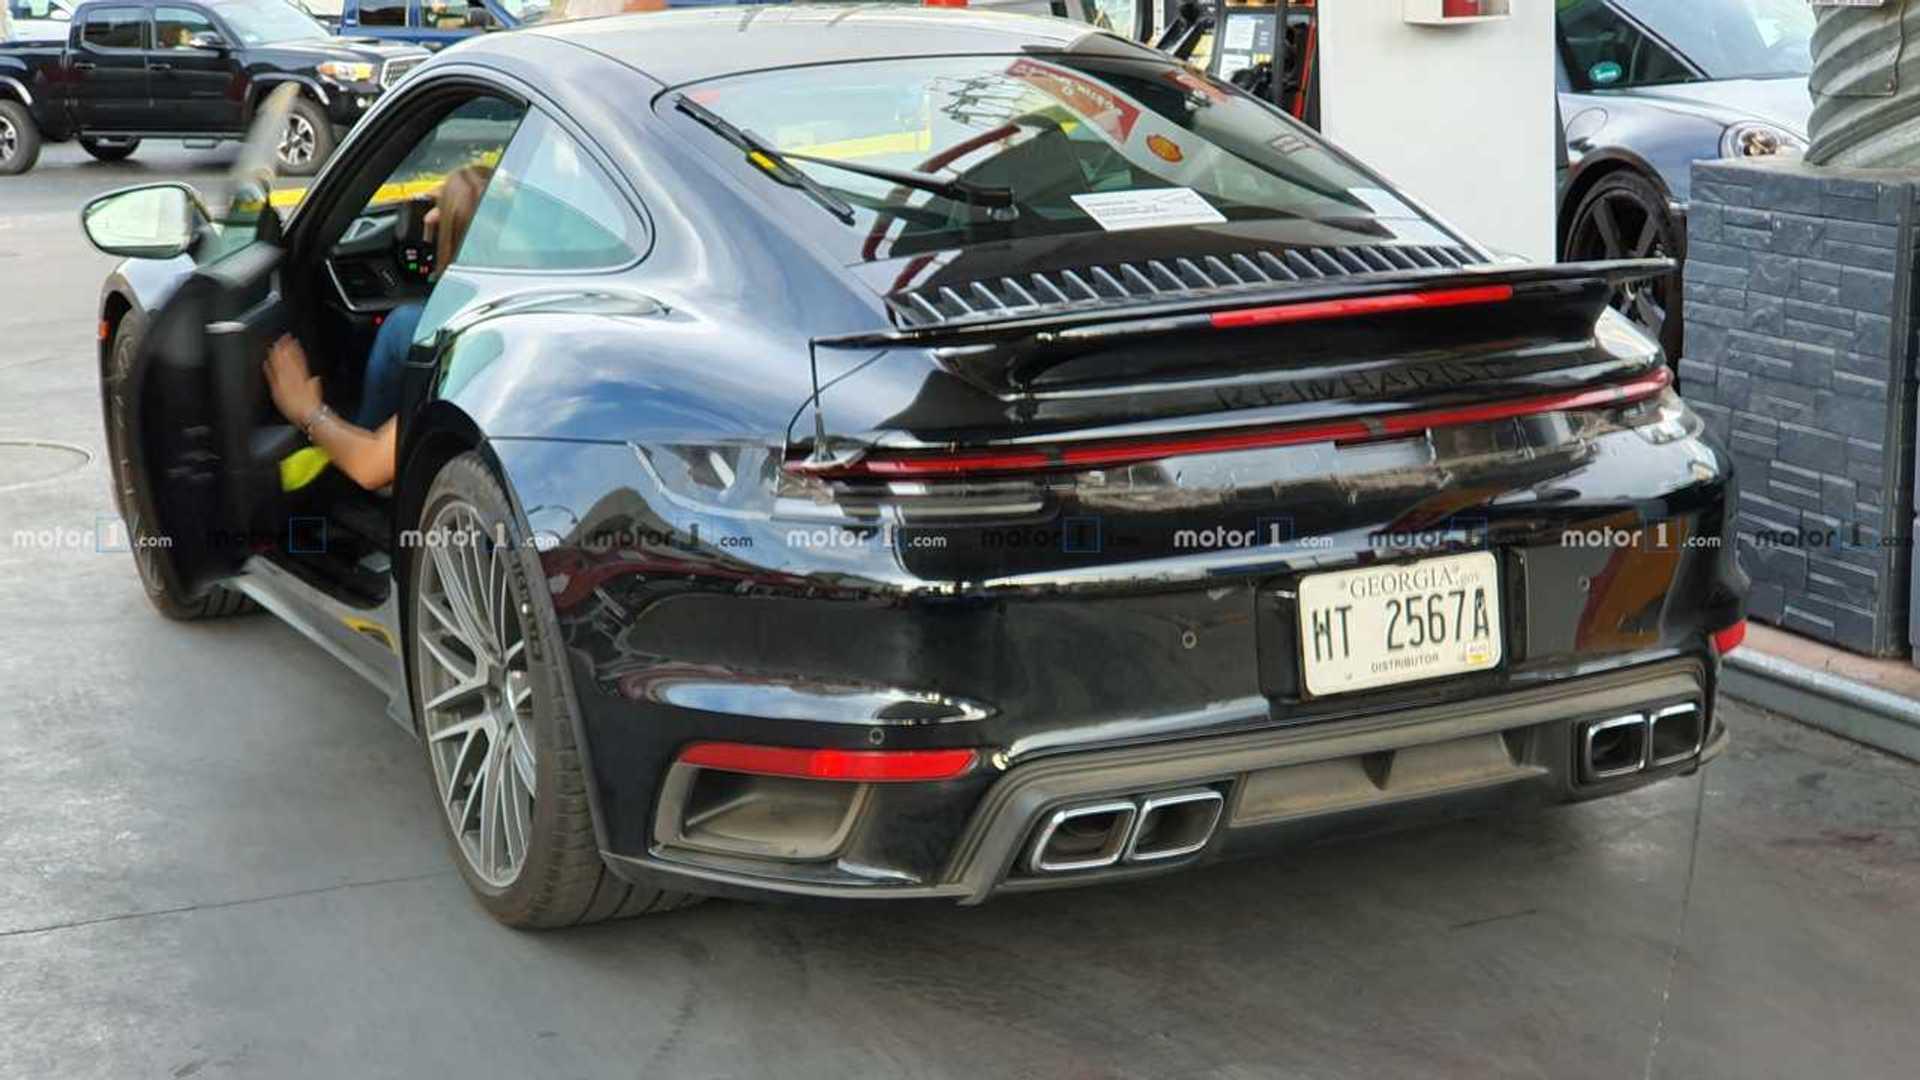 2018 - [Porsche] 911 - Page 16 Porsche-911-turbo-s-le-foto-spia